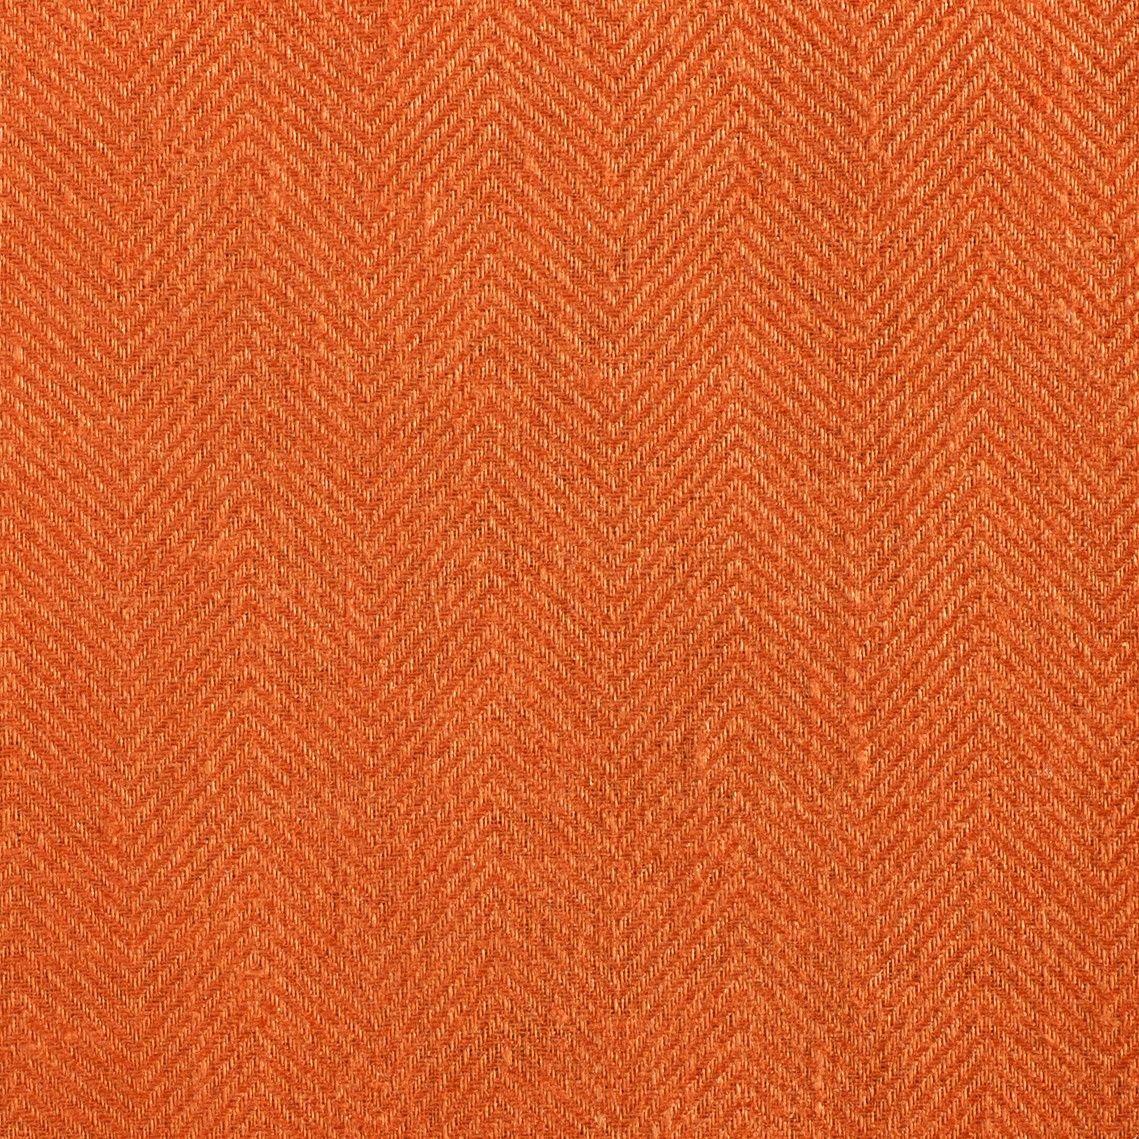 Anichini Fabrics Nobel Linen In Burnt Orange French